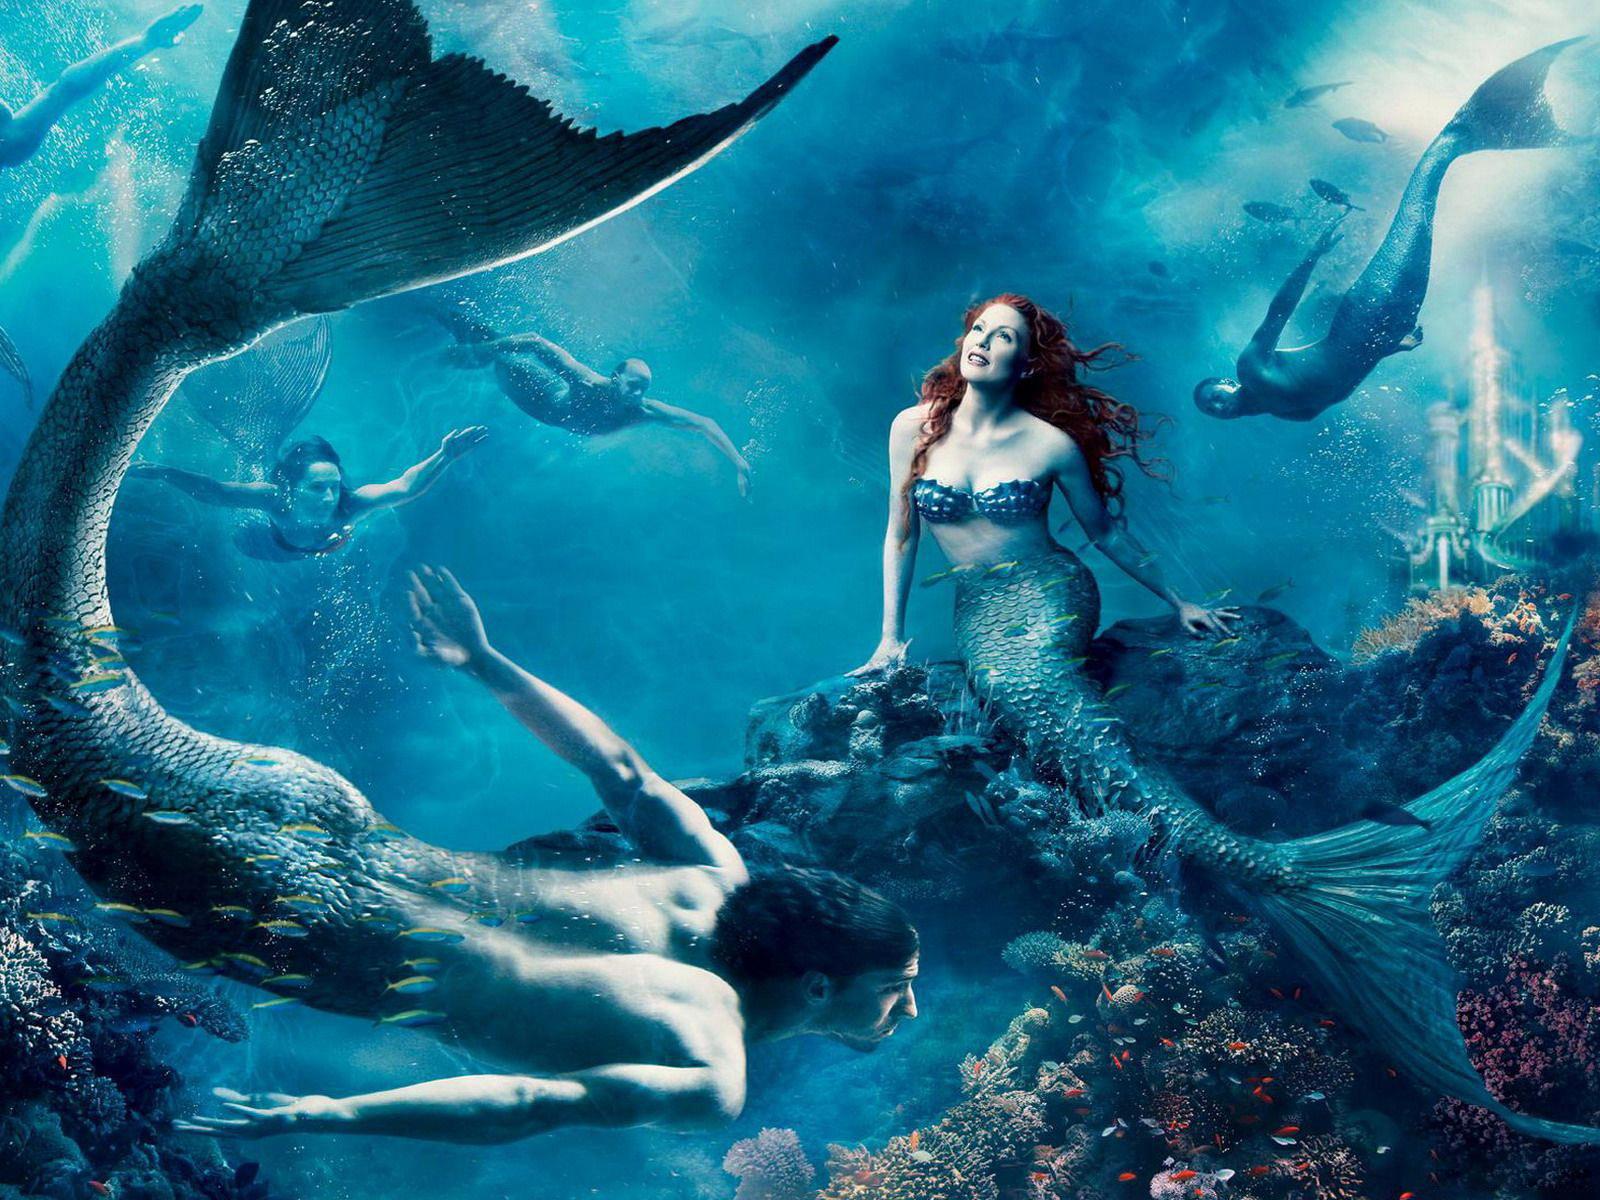 1000+ images about Fantasy on Pinterest | Fantasy girl, Mobile